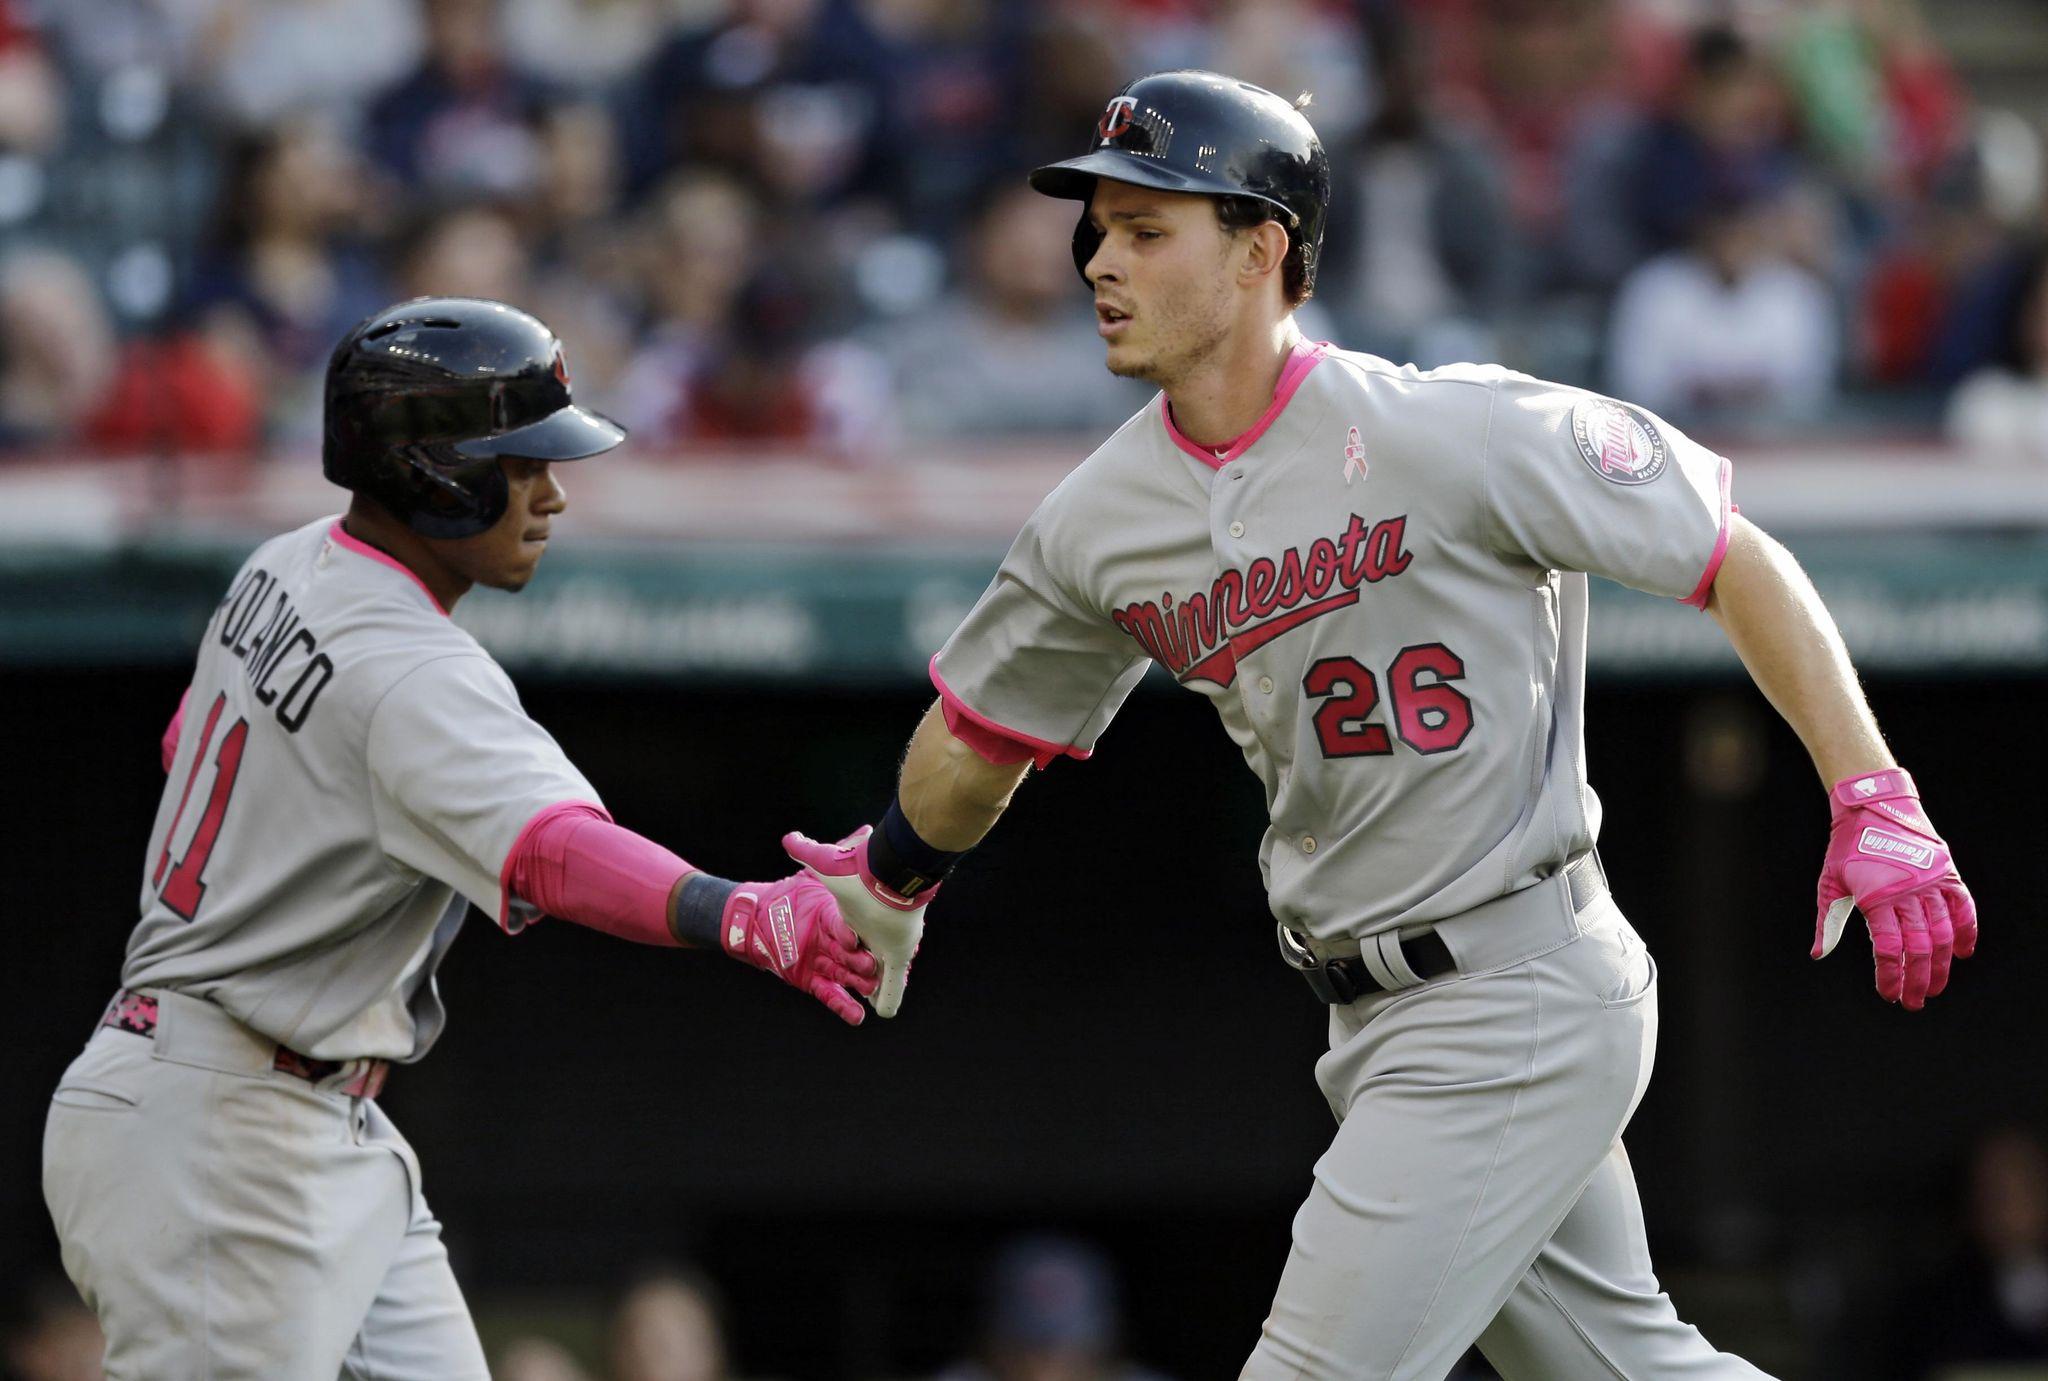 Twins-young_core_baseball_17744_s2048x1381